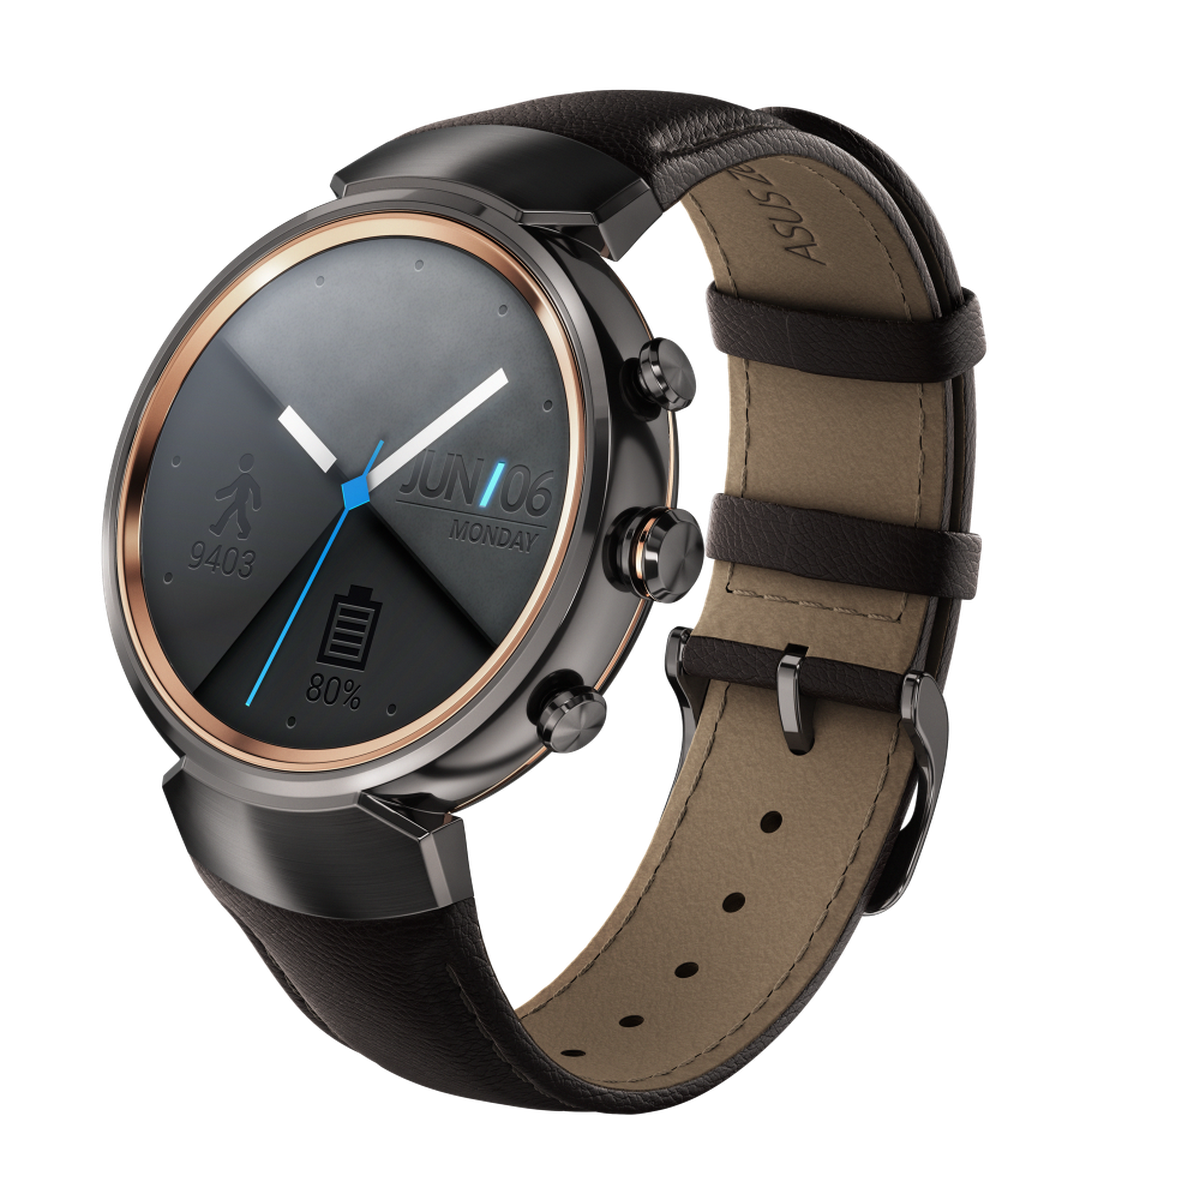 Best smartwatches of 2016